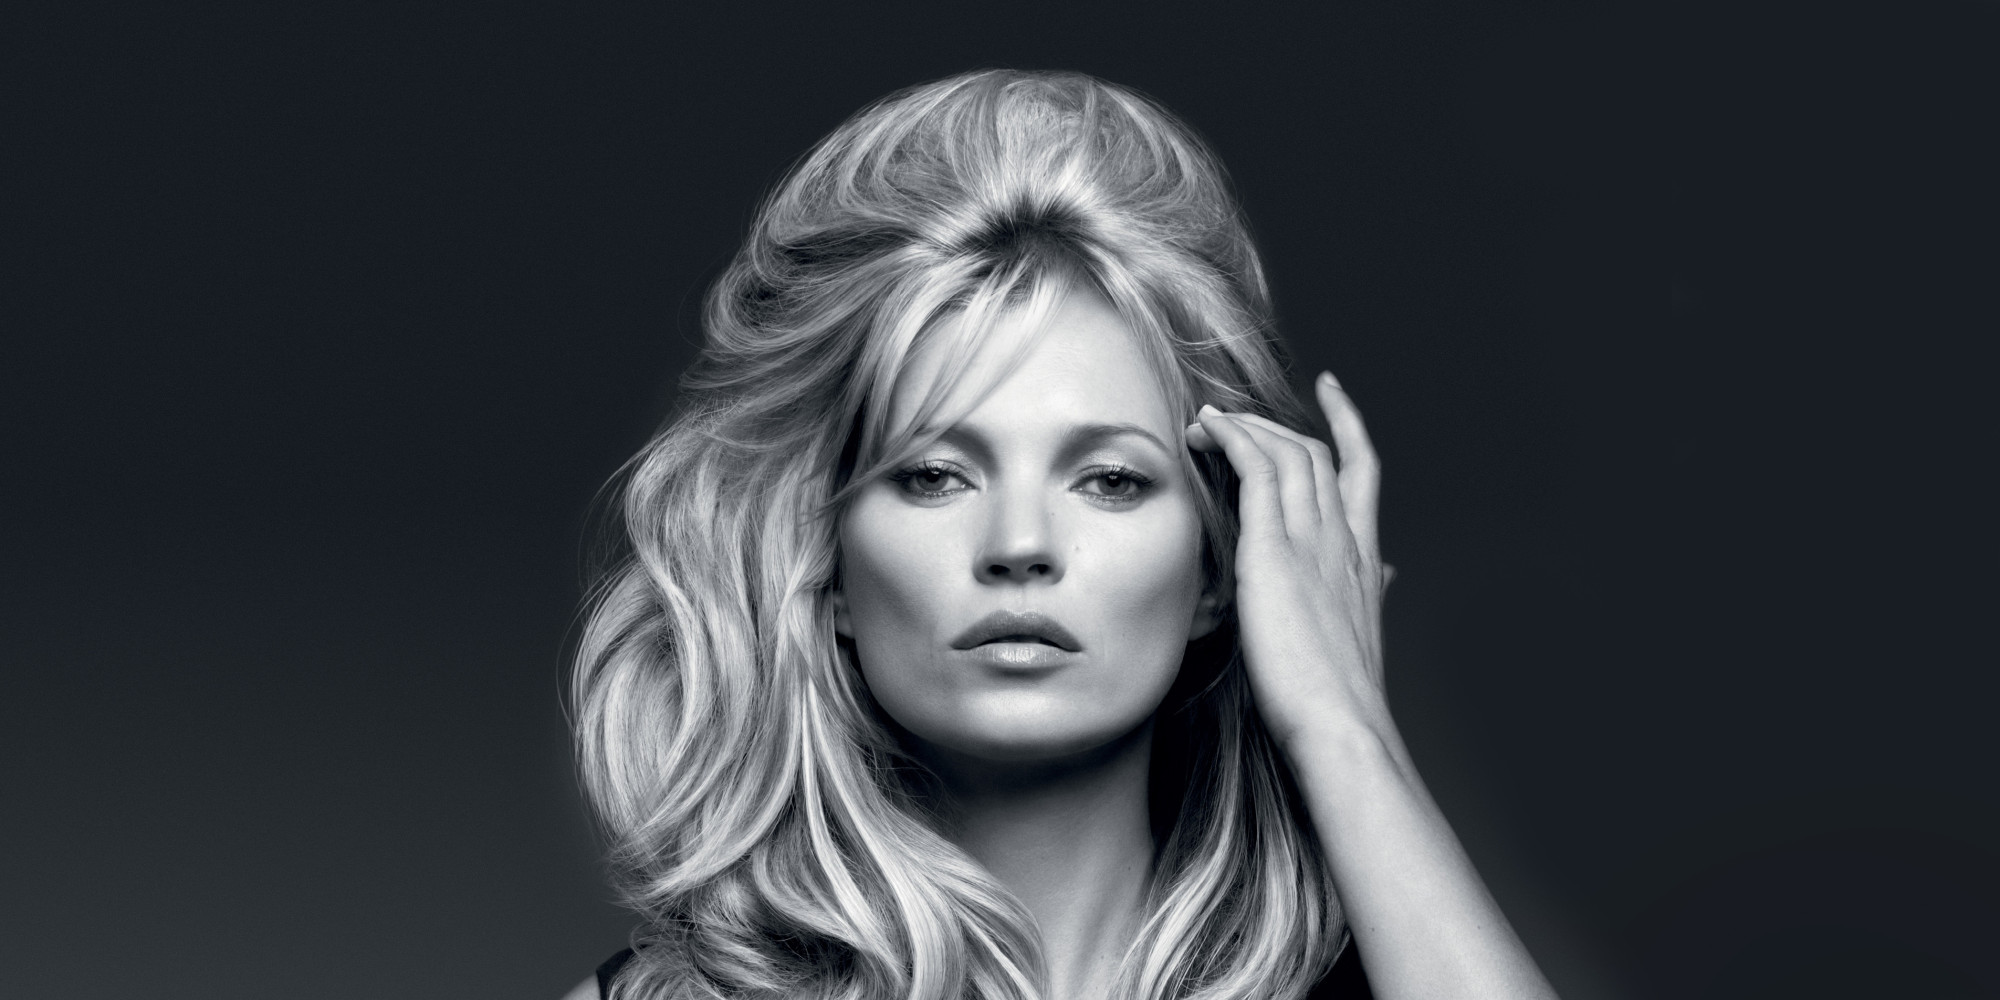 Ünlü Top Model Kate Moss Sevgilisini Tekme Tokat Dövdü!